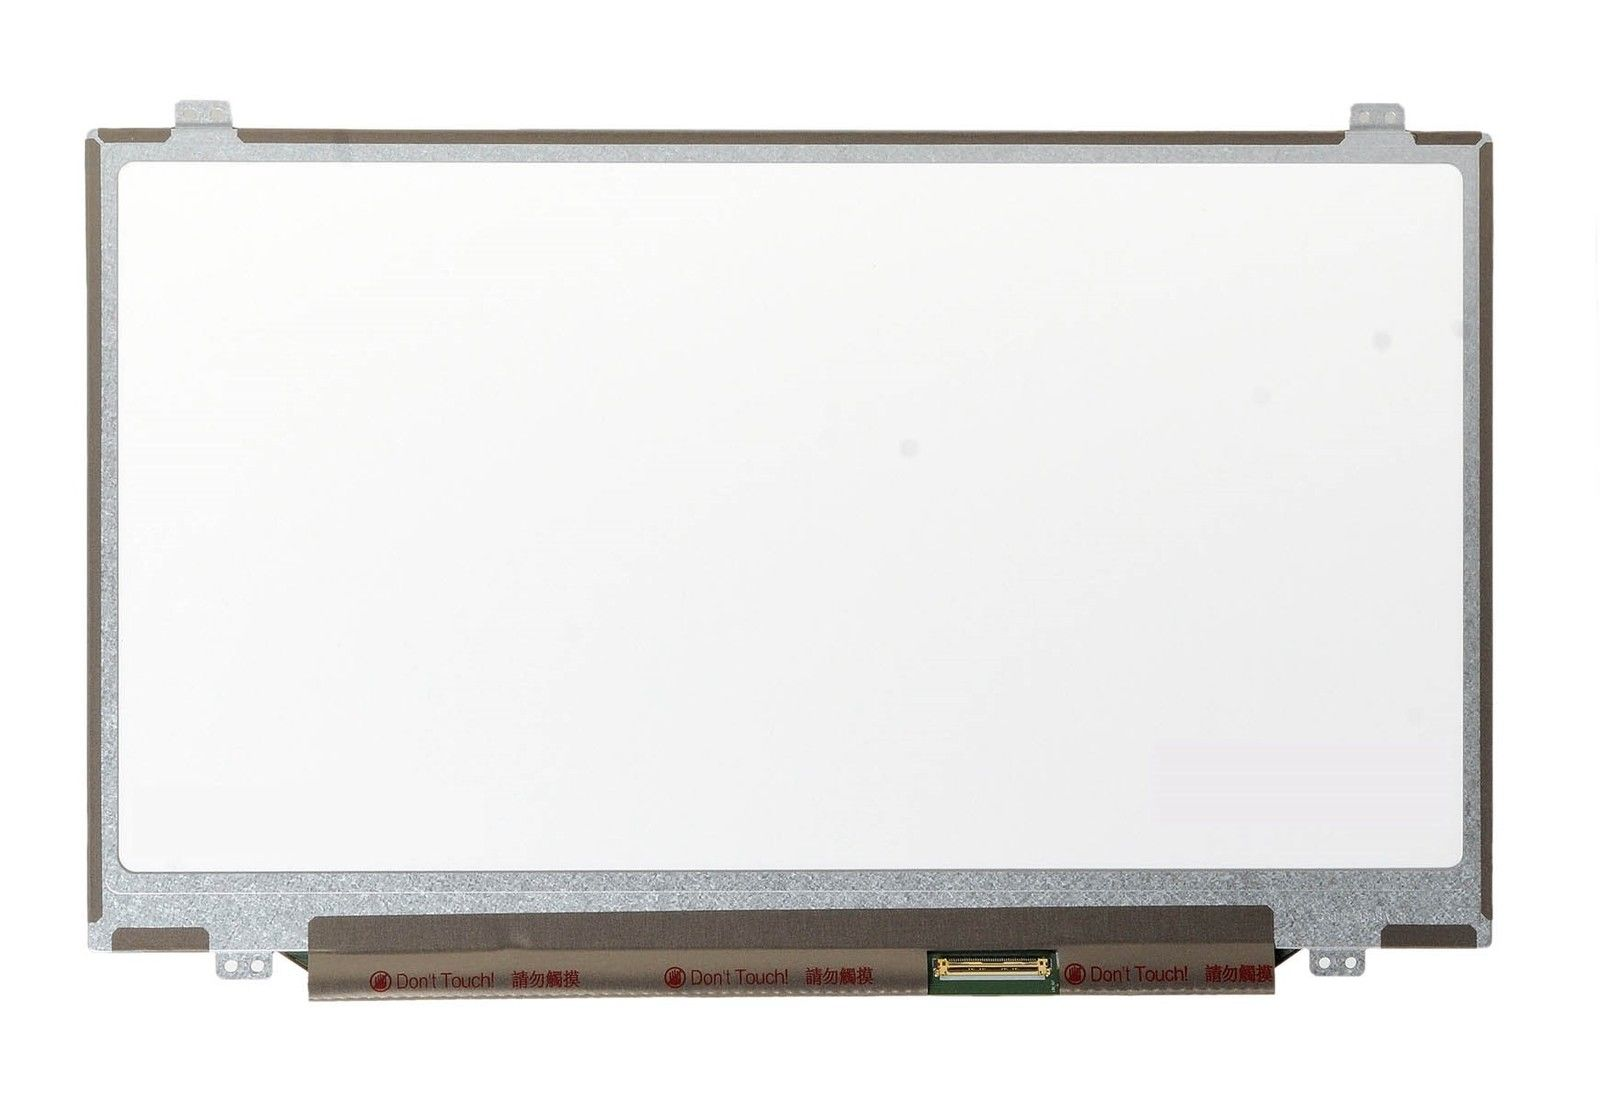 B140XTN03.6 New 14.0 WXGA HD Slim LED LCD Screen B140XTN03 V.6 Display Panel ht140wxb 501 new 14 0 led lcd screen wxga hd panel display